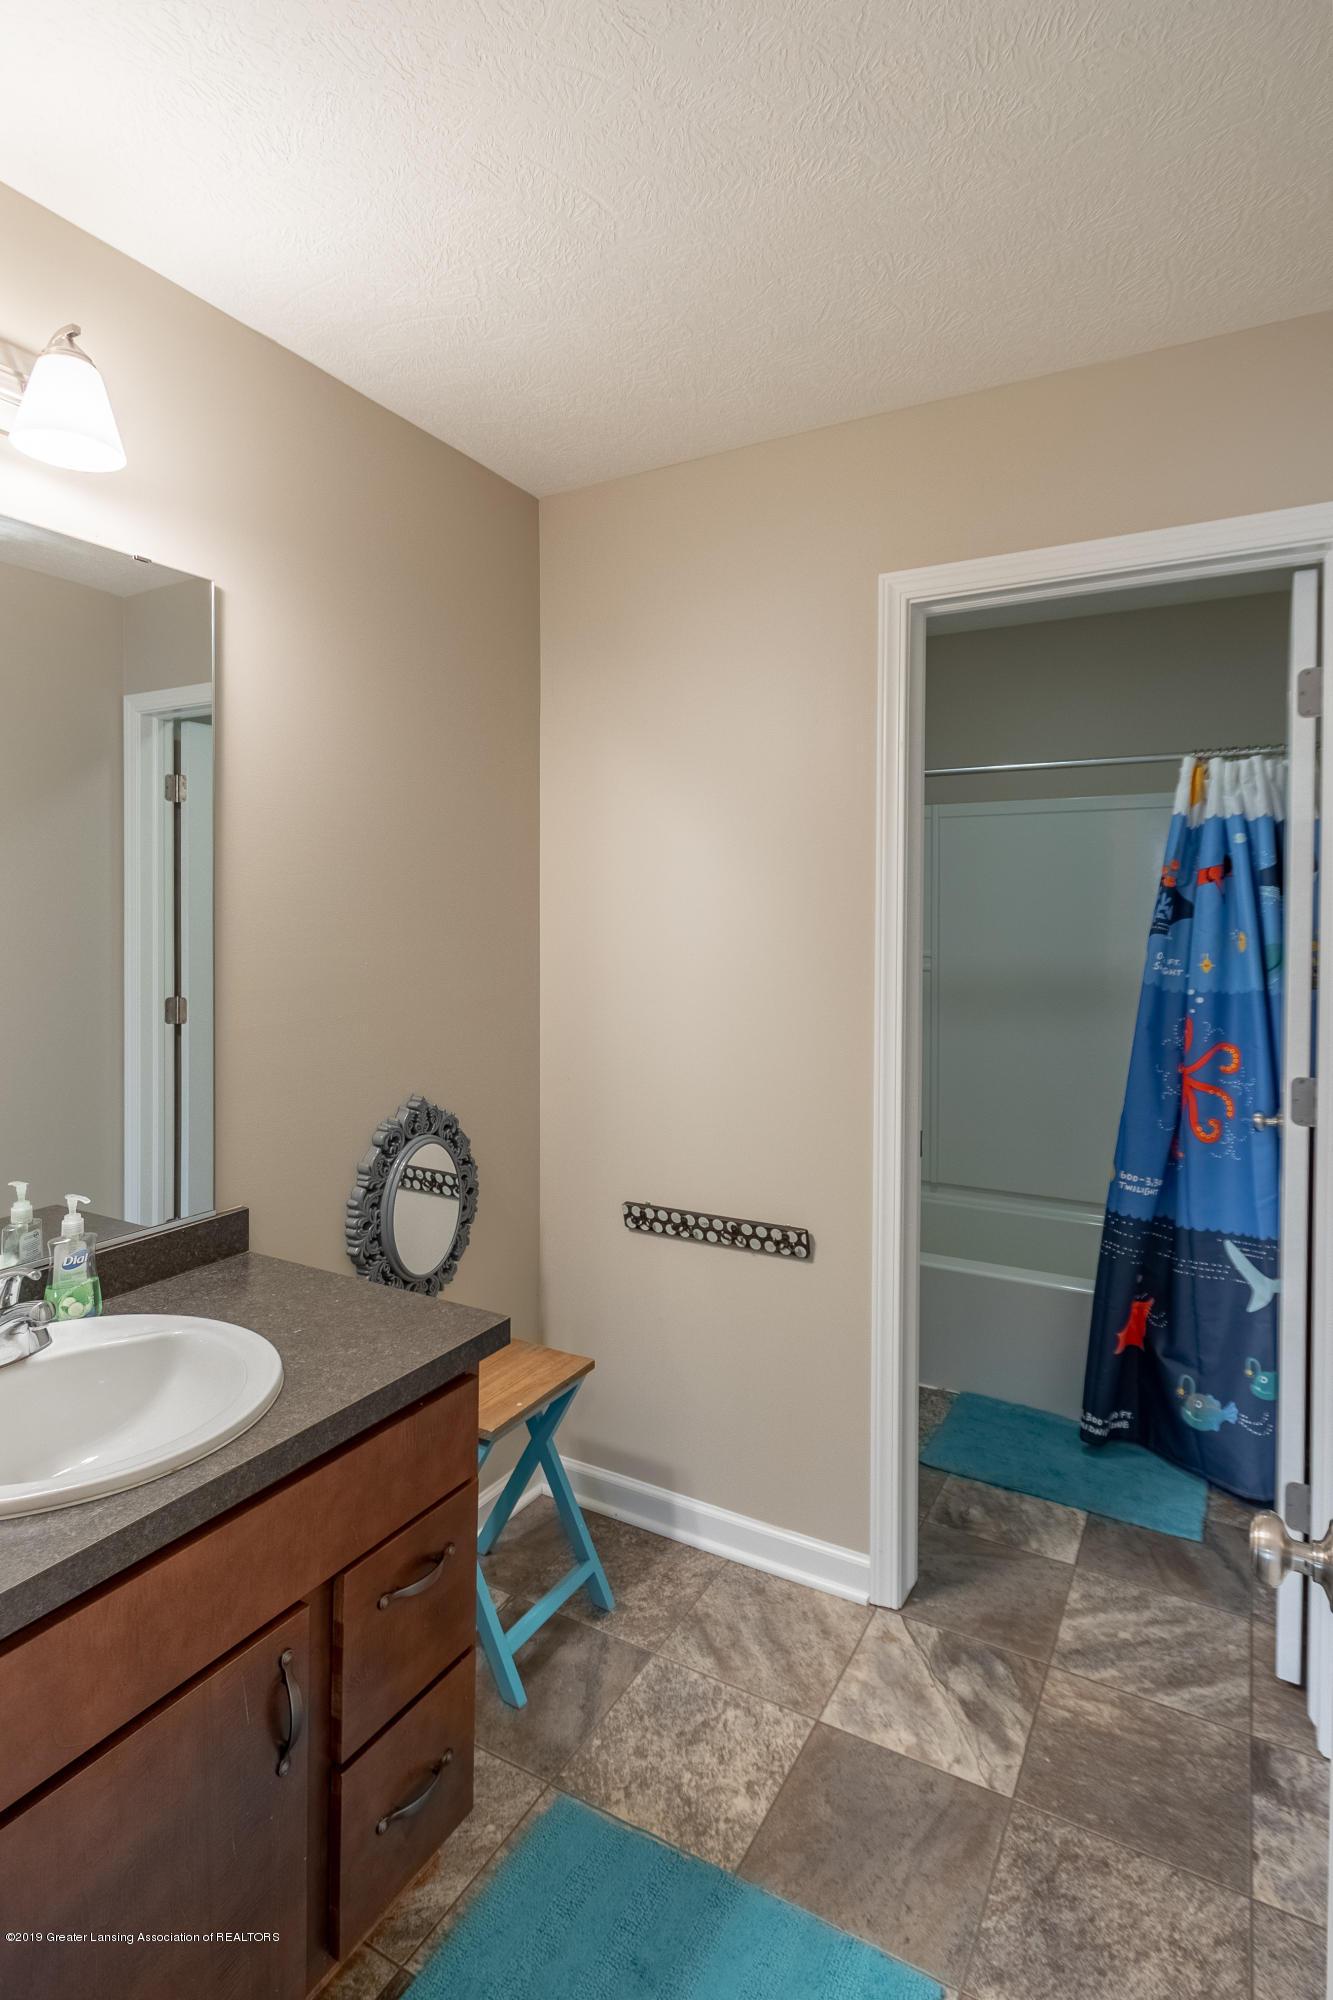 3758 Shearwater Ln - 2nd floor bathroom - 40